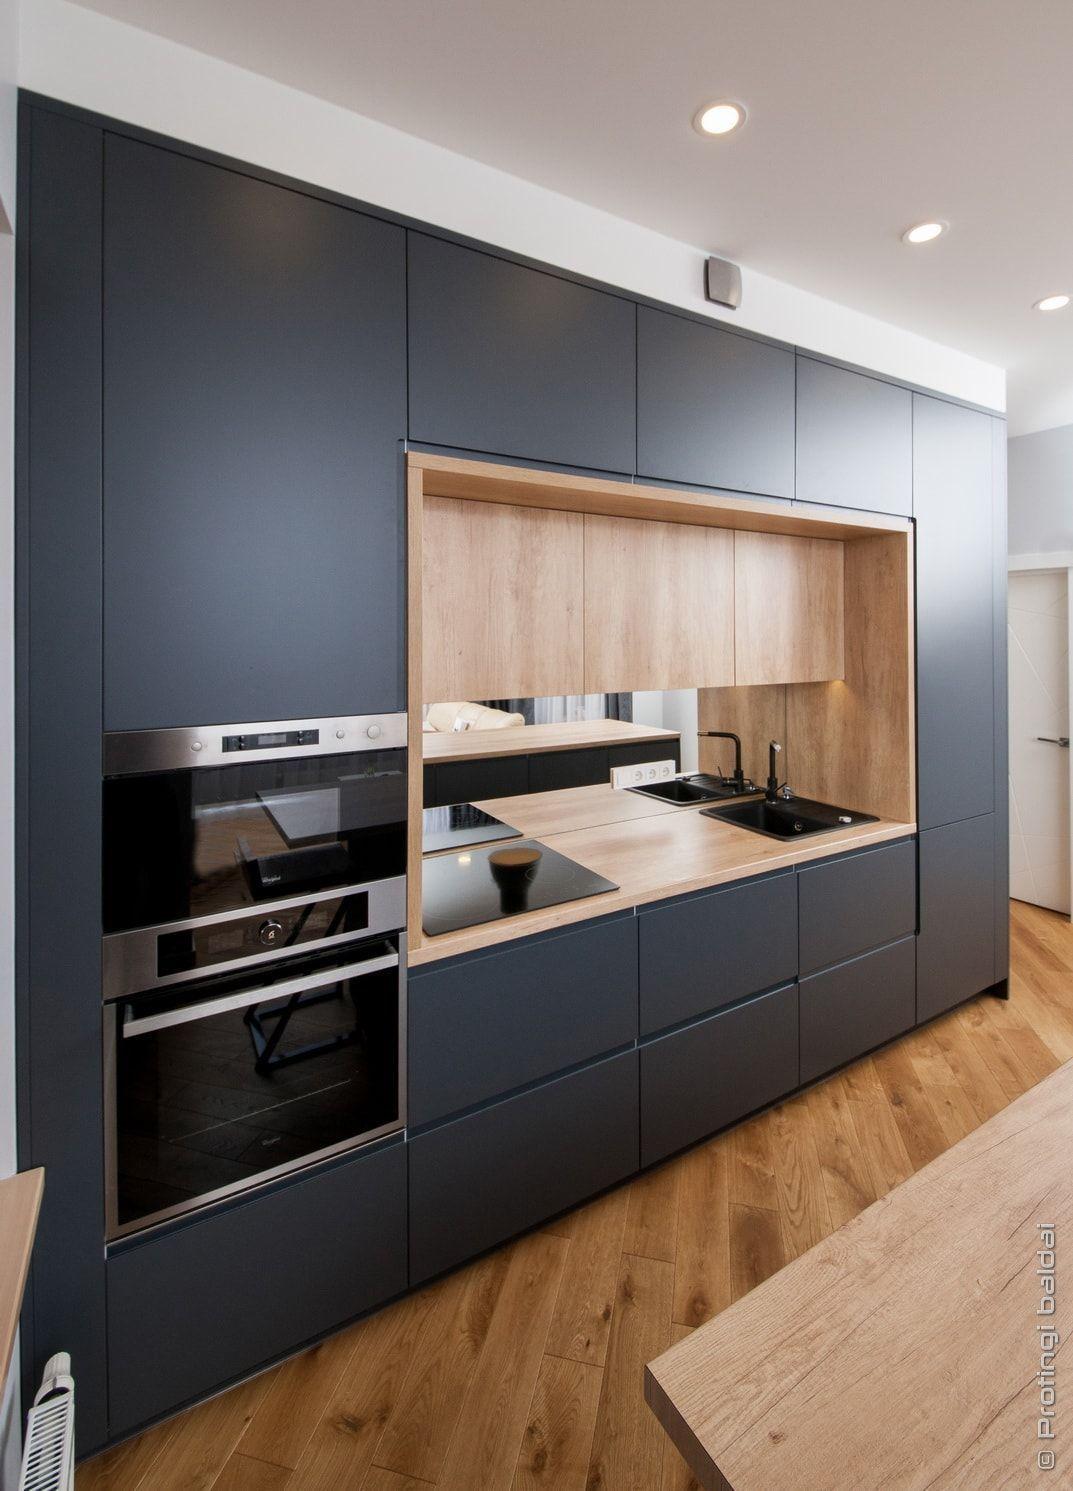 20 Kitchen Wall Ideas Elegant Wood Paneling In Decorating Kitchen